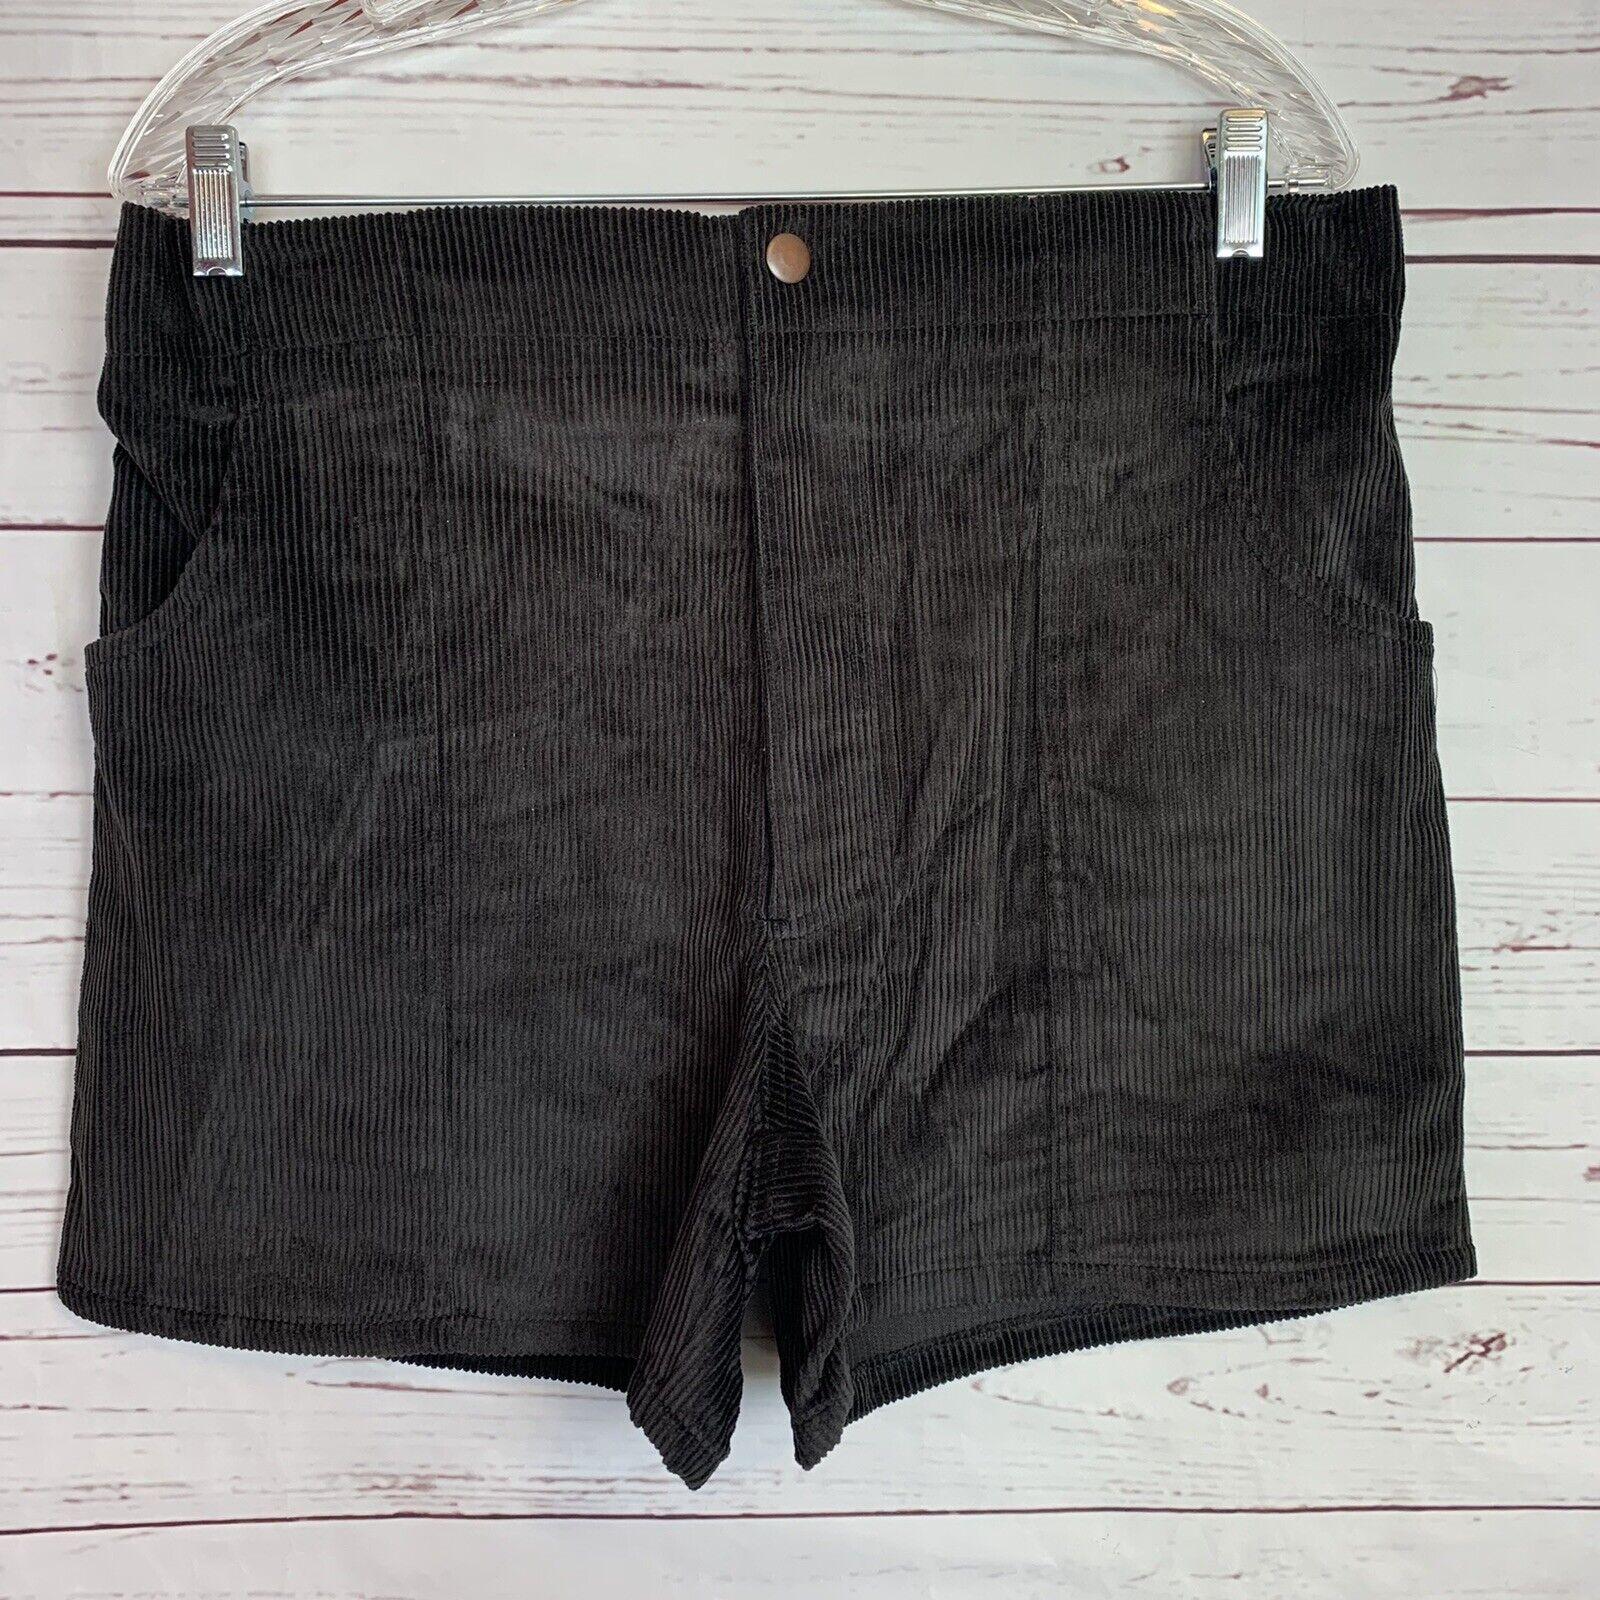 Vintage Black Corduroy Classics OP Style shorts size 32/34